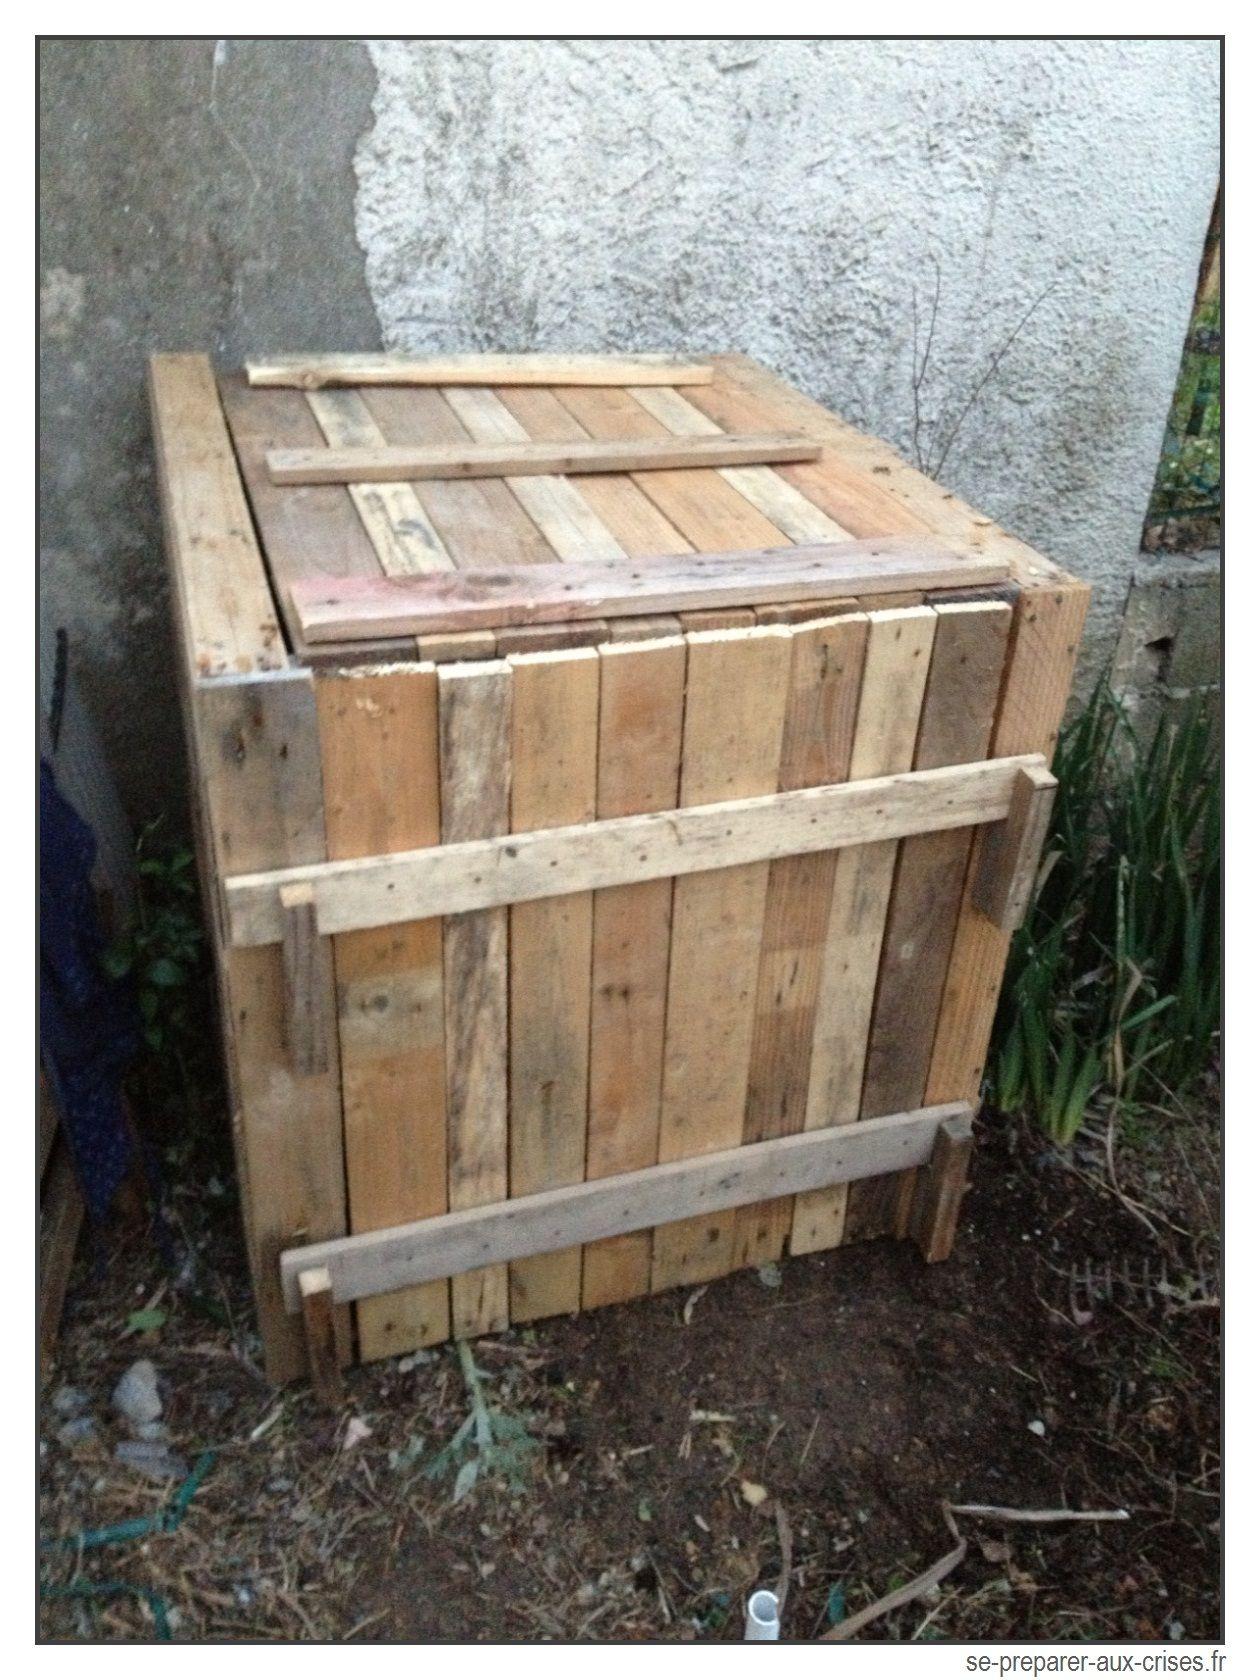 composteur en bois gratuit jardinage compost garden. Black Bedroom Furniture Sets. Home Design Ideas